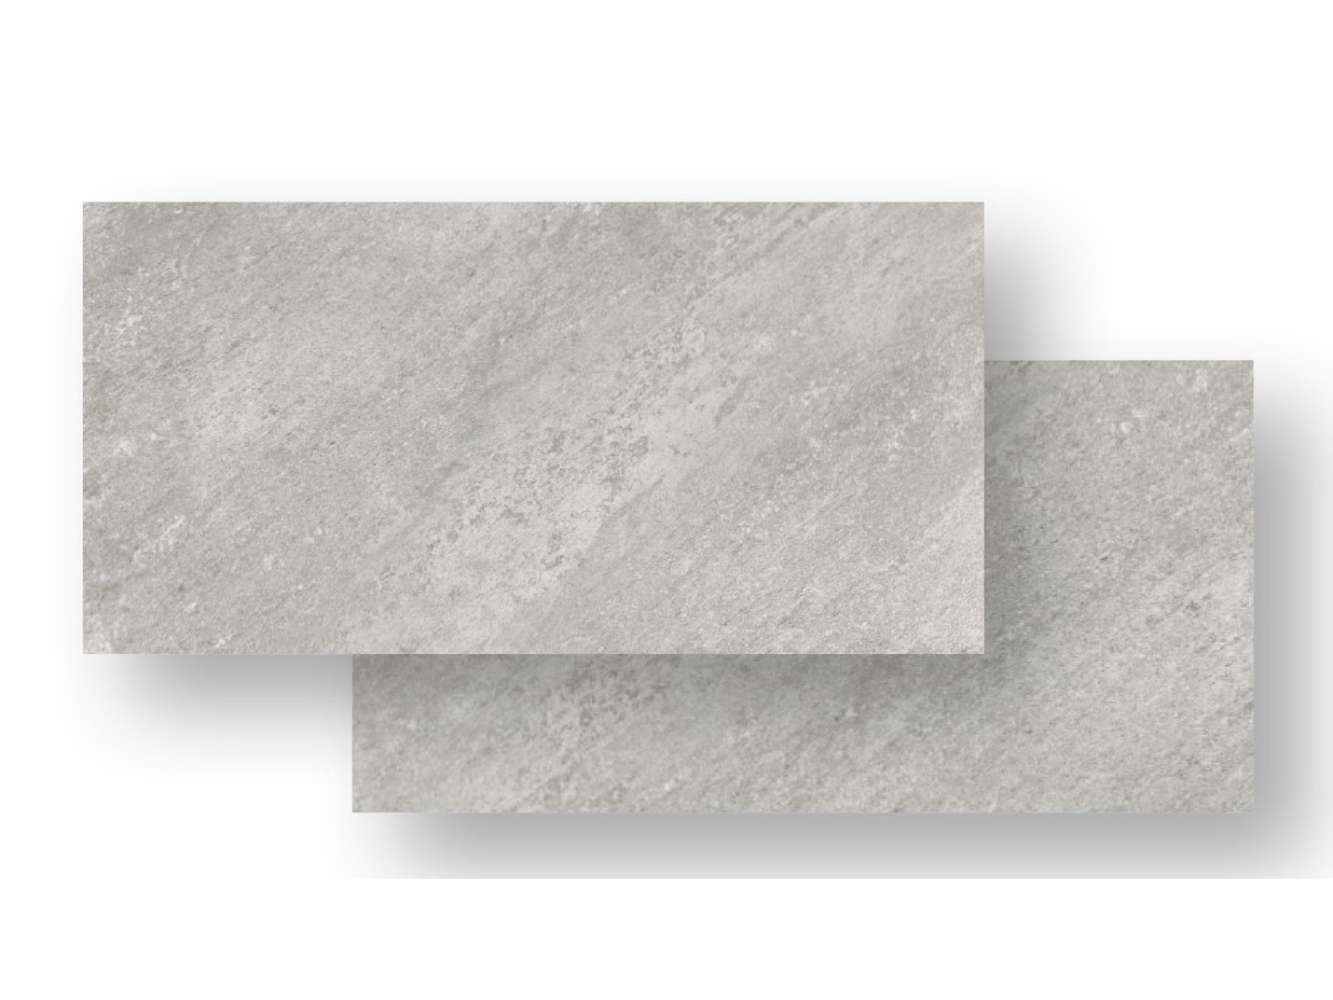 Bodenfliese Quarry Feinsteinzeug Grey rektifiziert, 80x40x1 cm